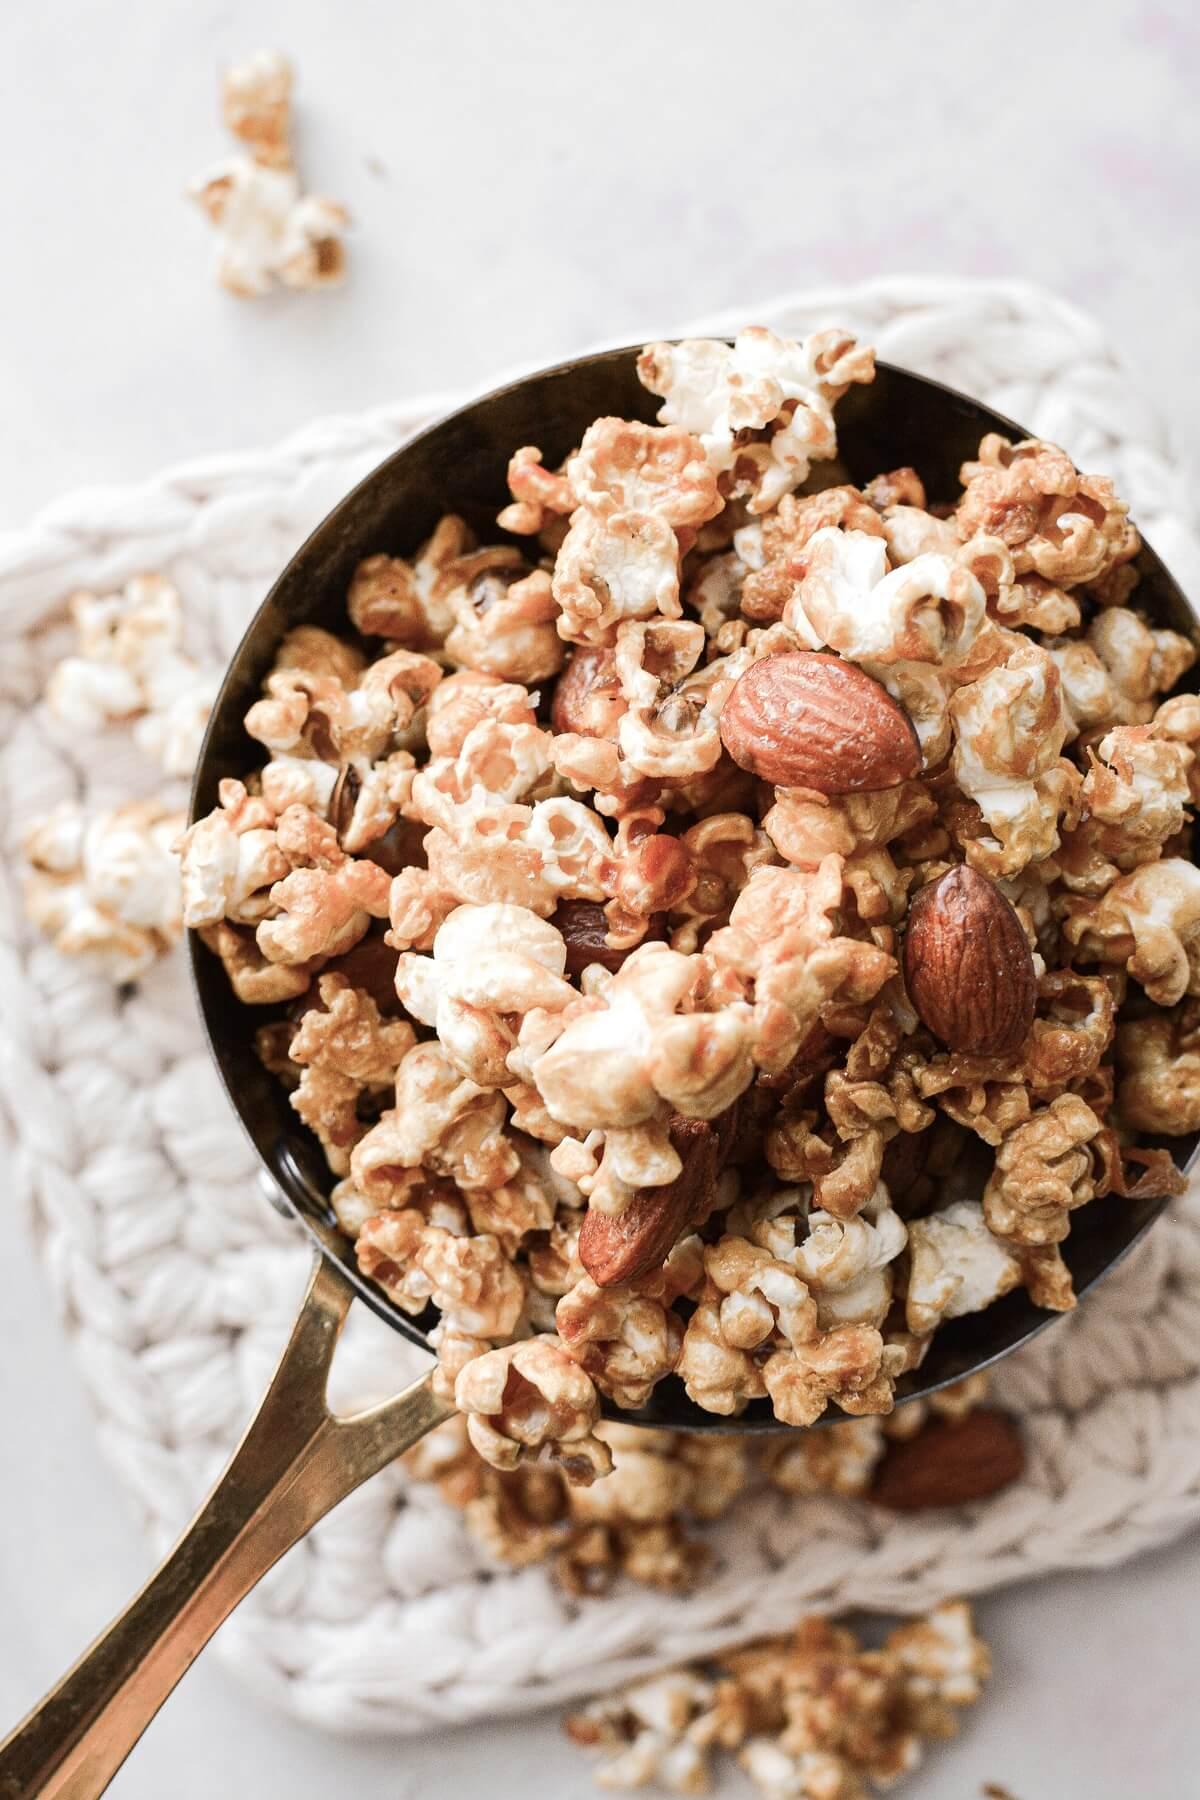 Homemade caramel popcorn and almonds in a saucepan.